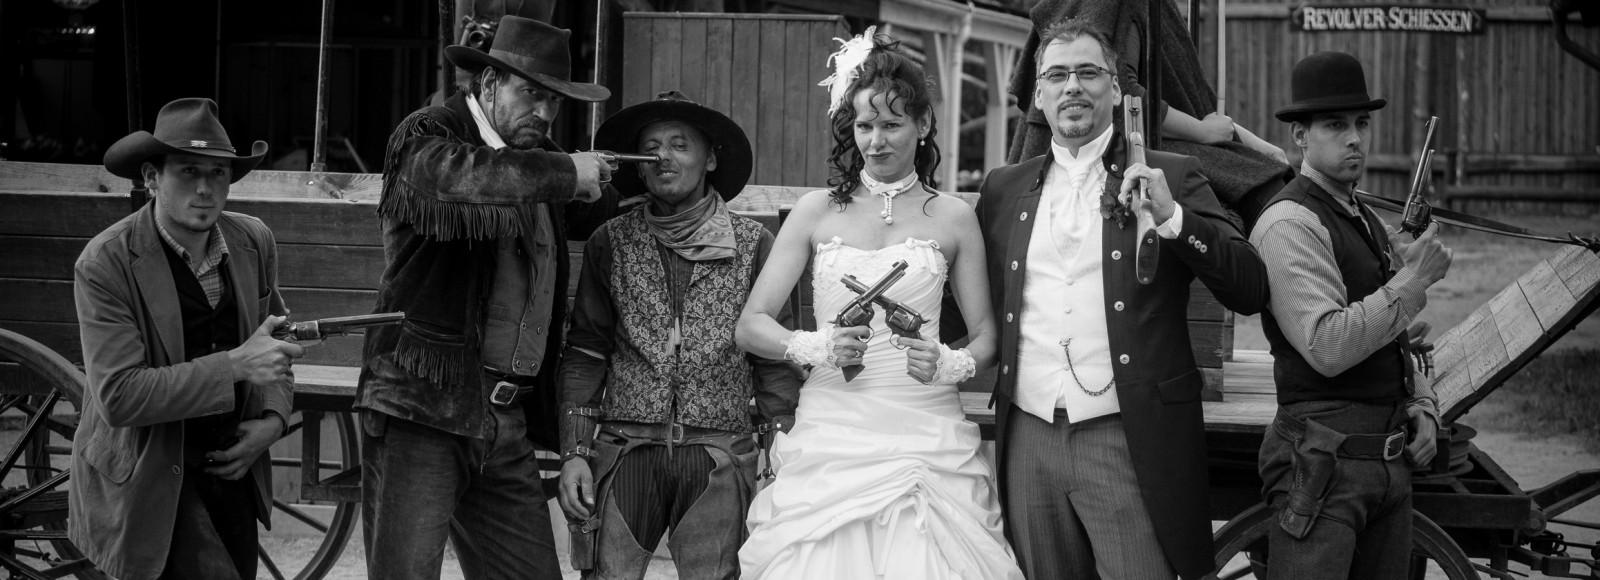 Hochzeitsfotografie-Luptscho.de-03